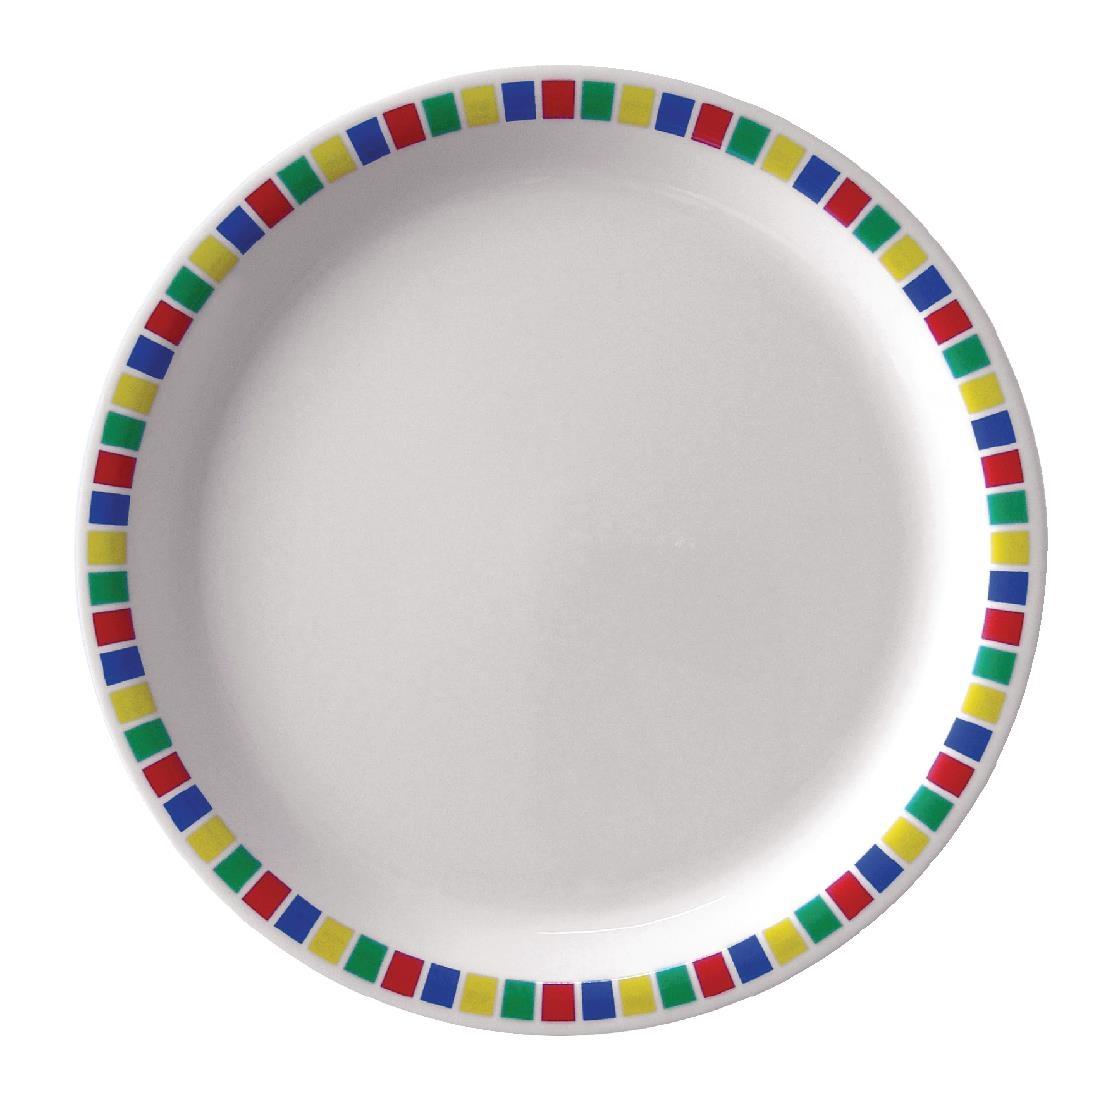 Fairground Plate